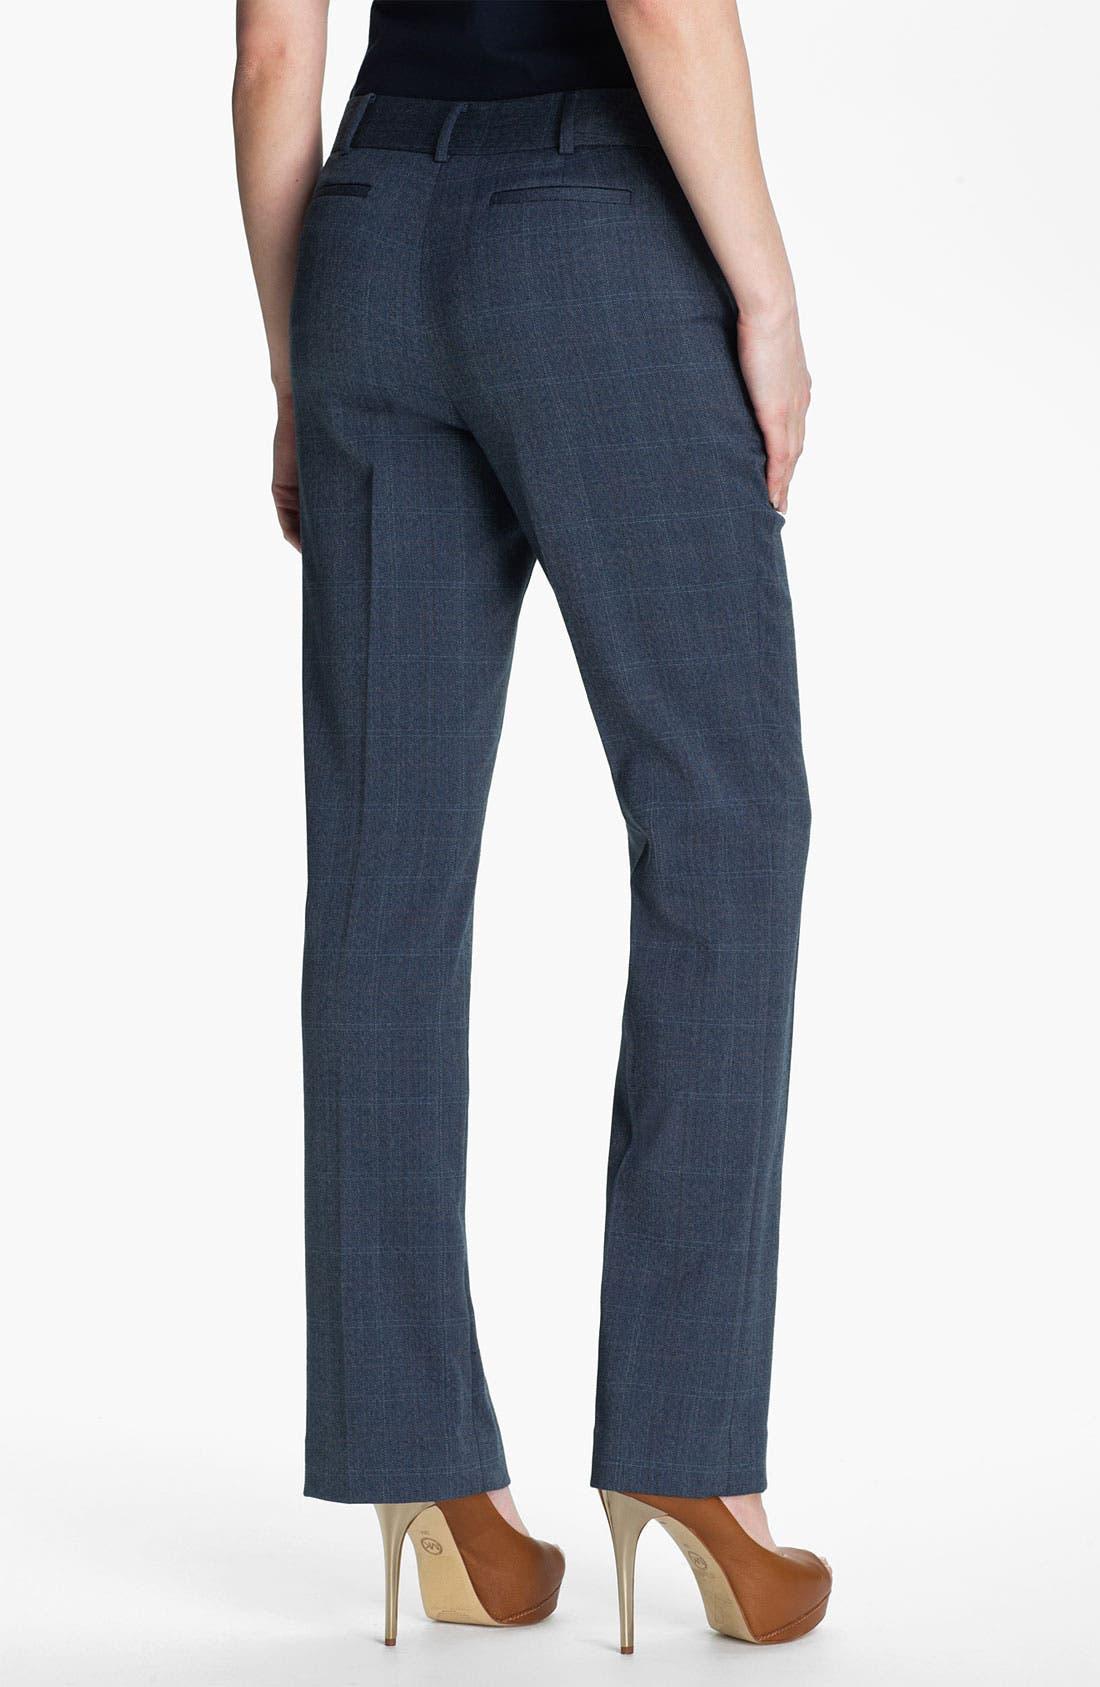 Alternate Image 2  - Anne Klein Patterned Menswear Pants